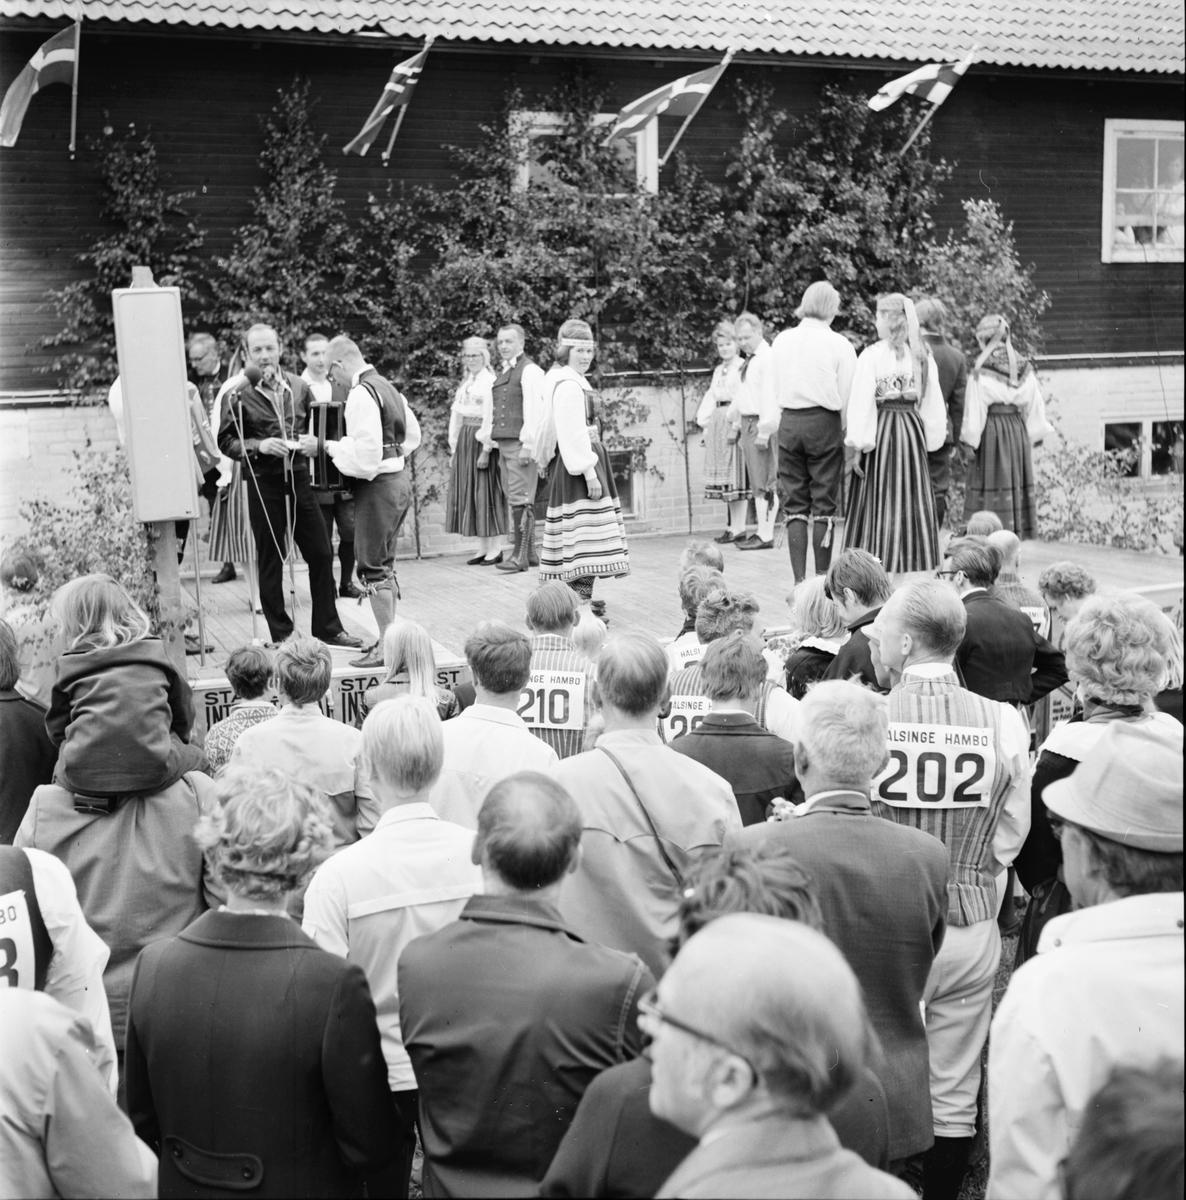 Arbrå, Hälsingehambon, 1970